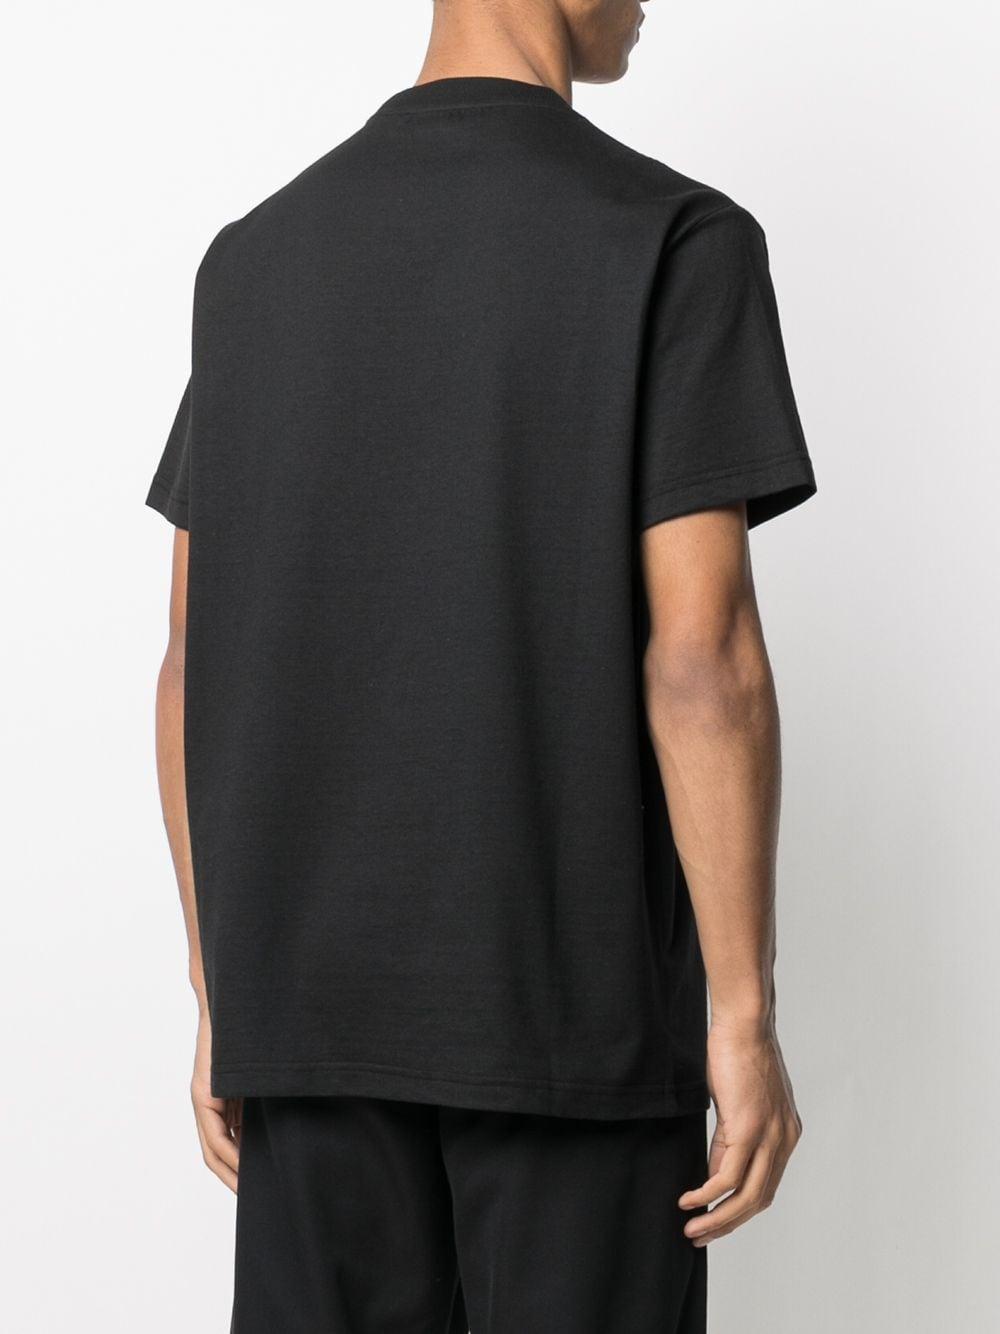 1017 Alyx 9Sm t-shirt visual unisex 1017 ALYX 9SM | T-shirt | AVUTS0216FA01BLK0001